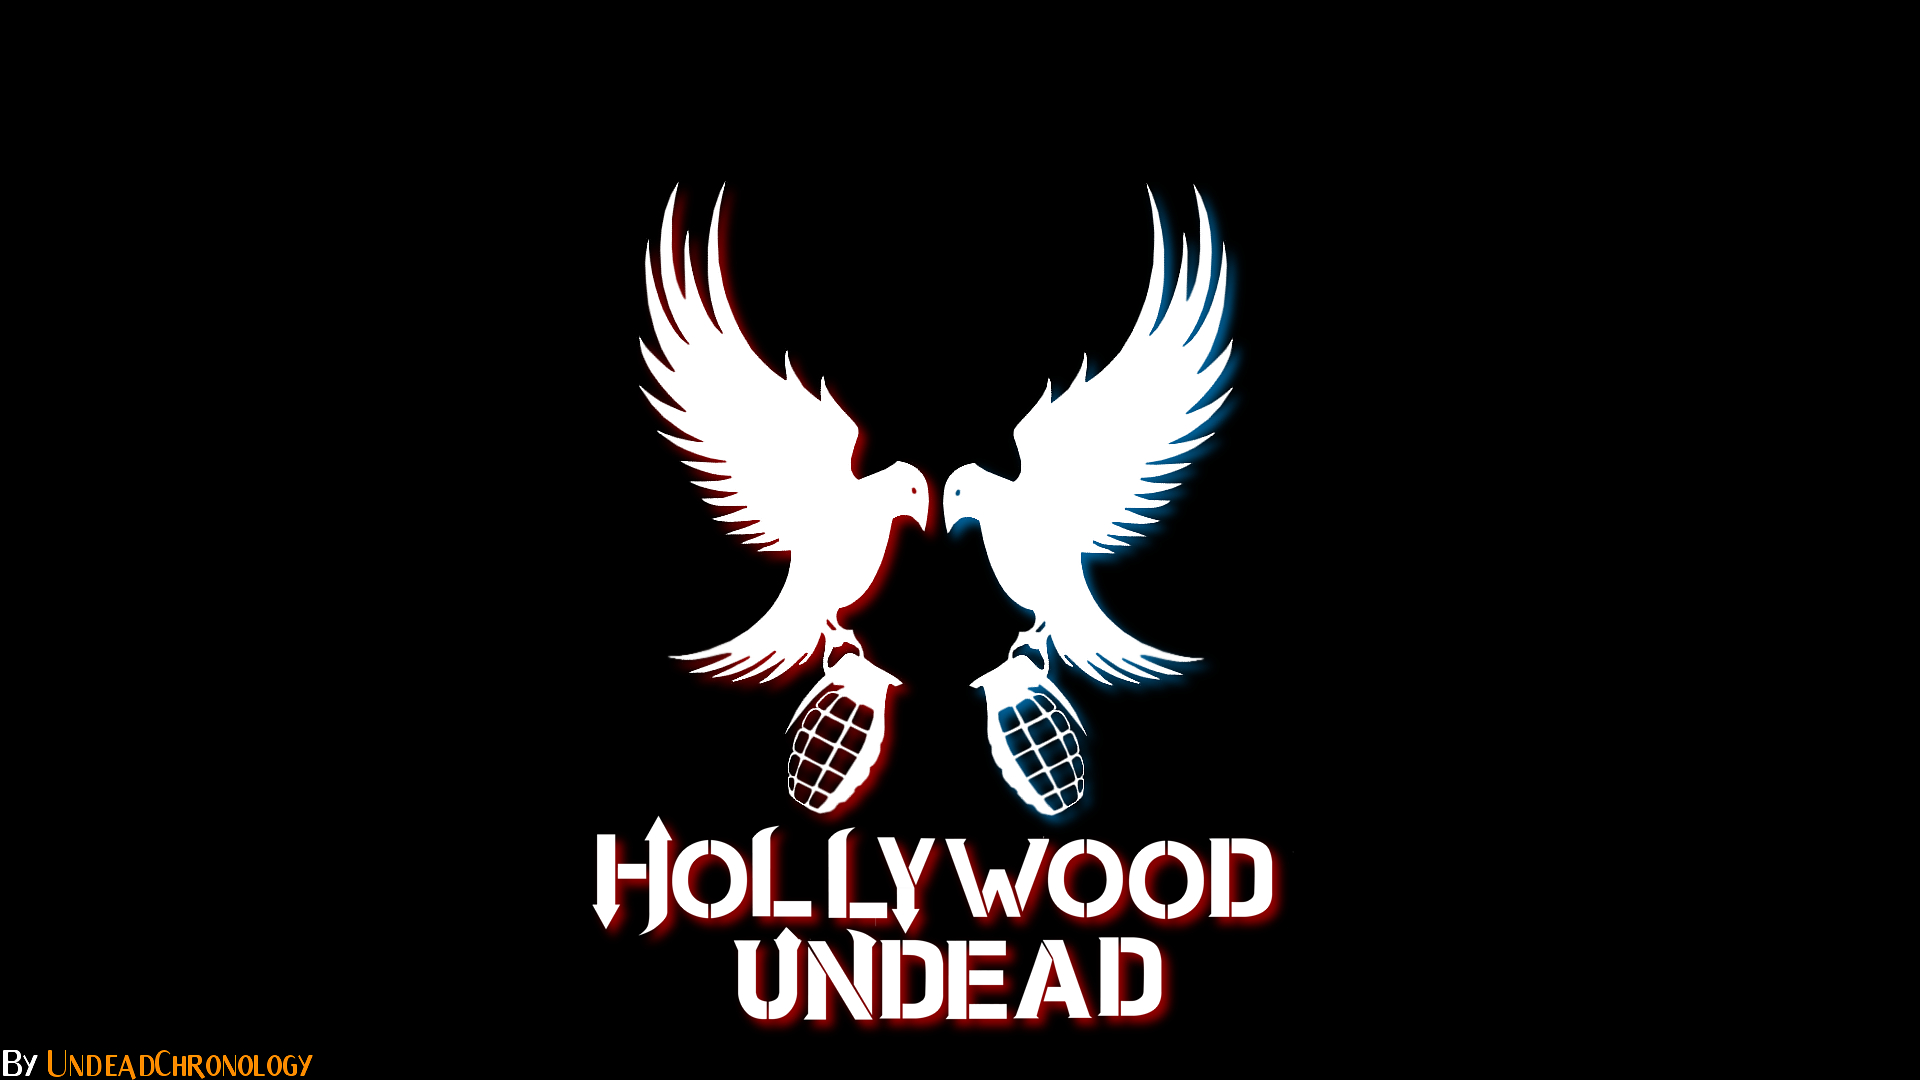 simple hollywood undead wallpaper 1080p by dcfempx fan art wallpaper 1920x1080